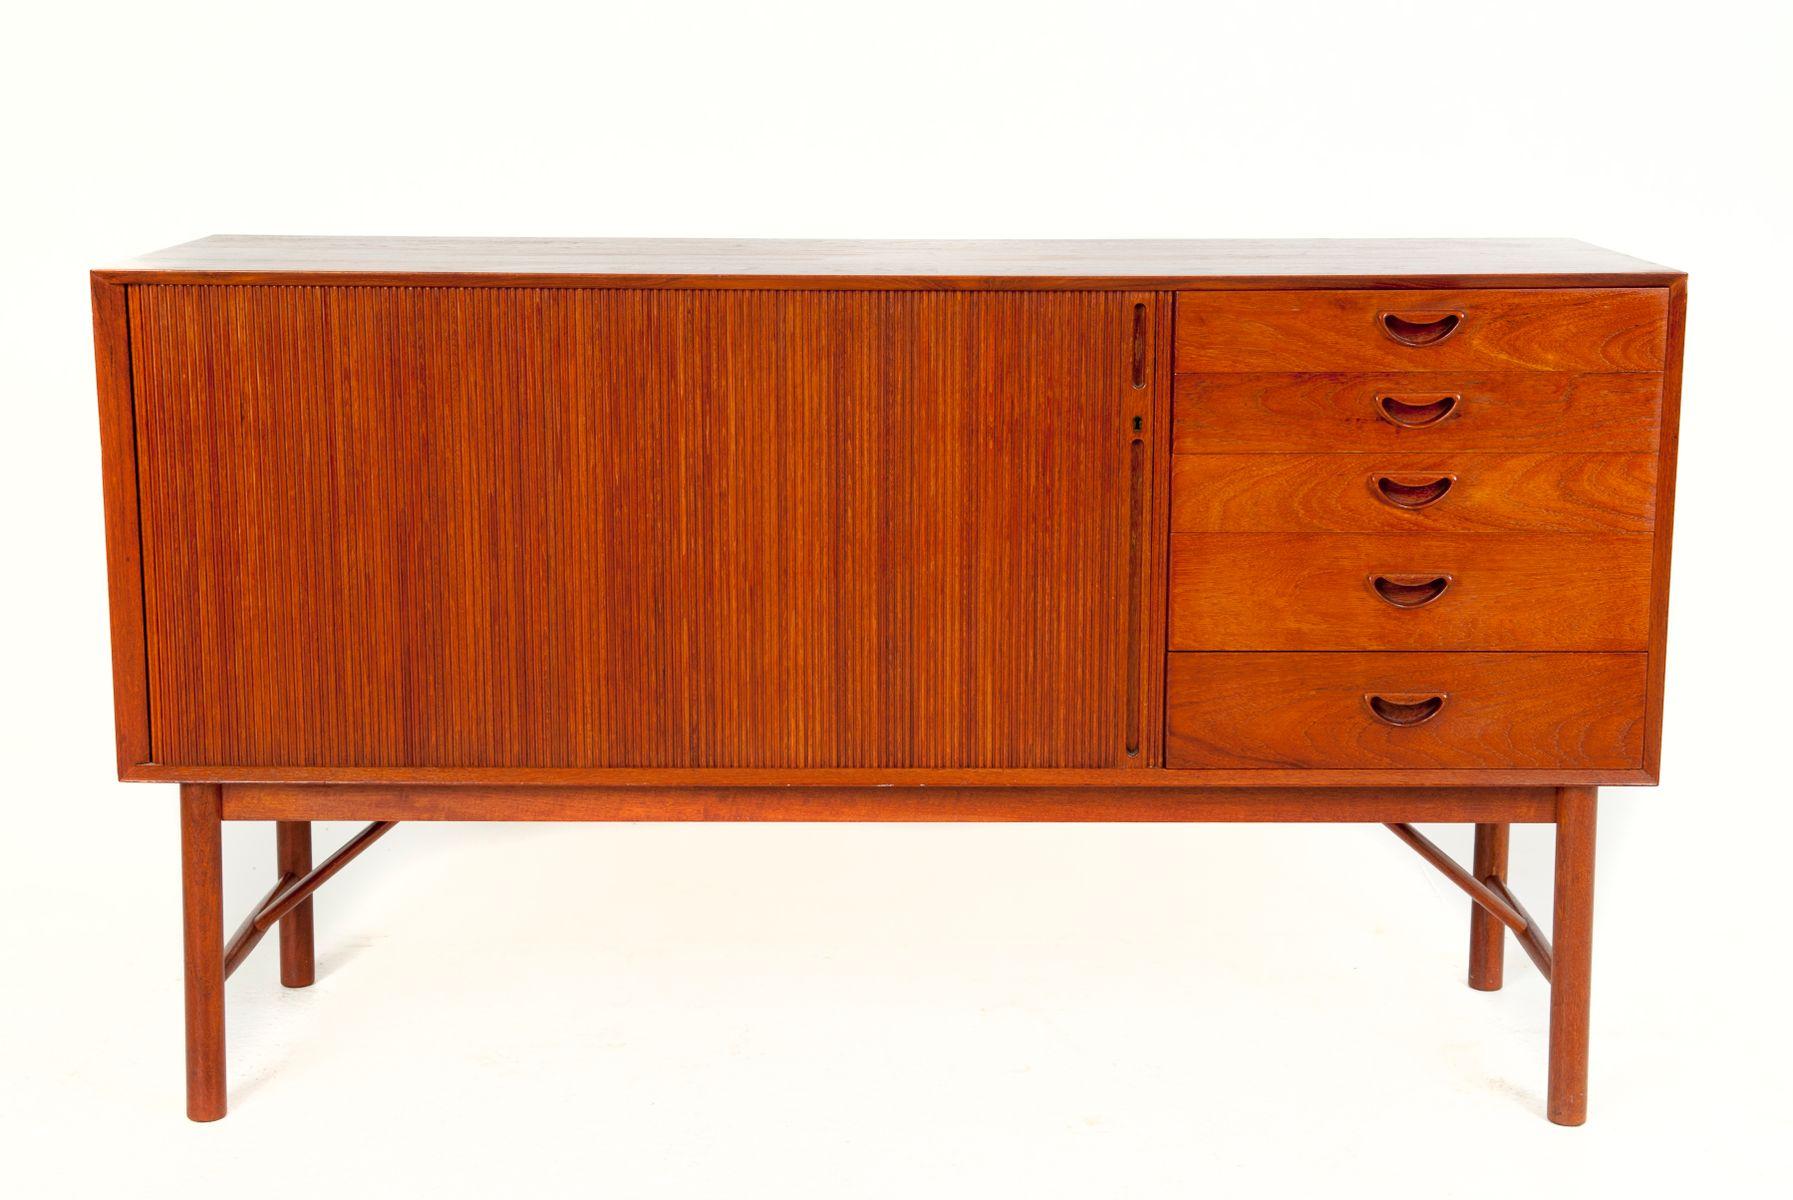 Danish Design Credenza : Sold teak credenza by danish designer kai kristiansen item